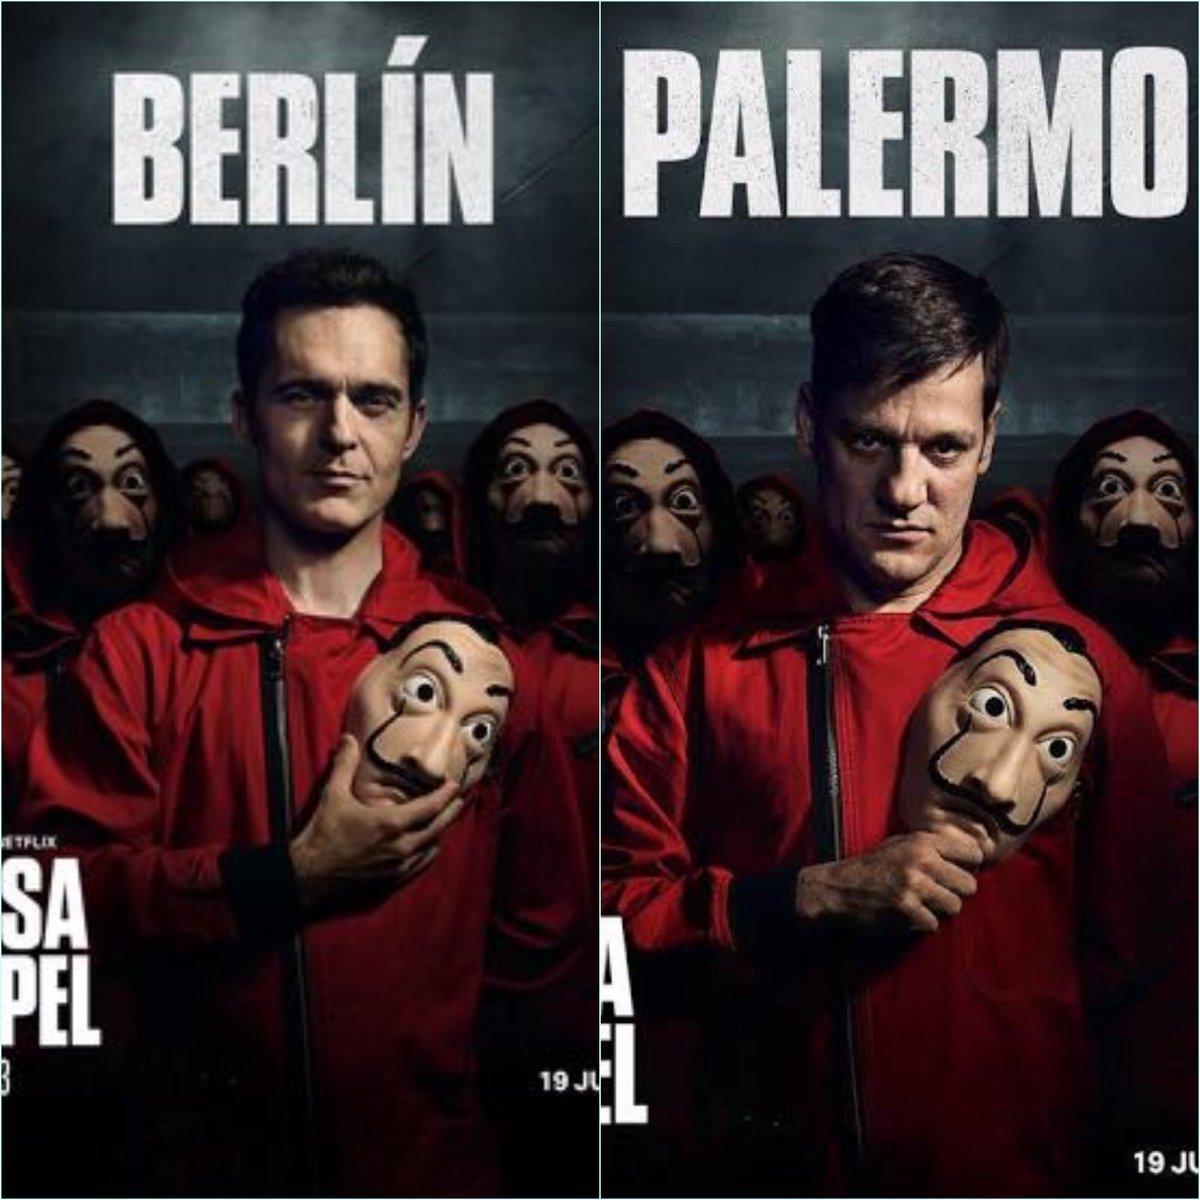 "/mvs/ ⚠️LCDP SPOILER ALERT  kenapa si pd bilang ""yg pilih Palermo org gila"" pdhl mah sama aja, Berlin jg jahad dulu ngebuang Tokyo ke polisi. Palermo bgitu jg krn Tokyo duluan yg Kudeta. ga ada api ga ada asap bos 🙂"